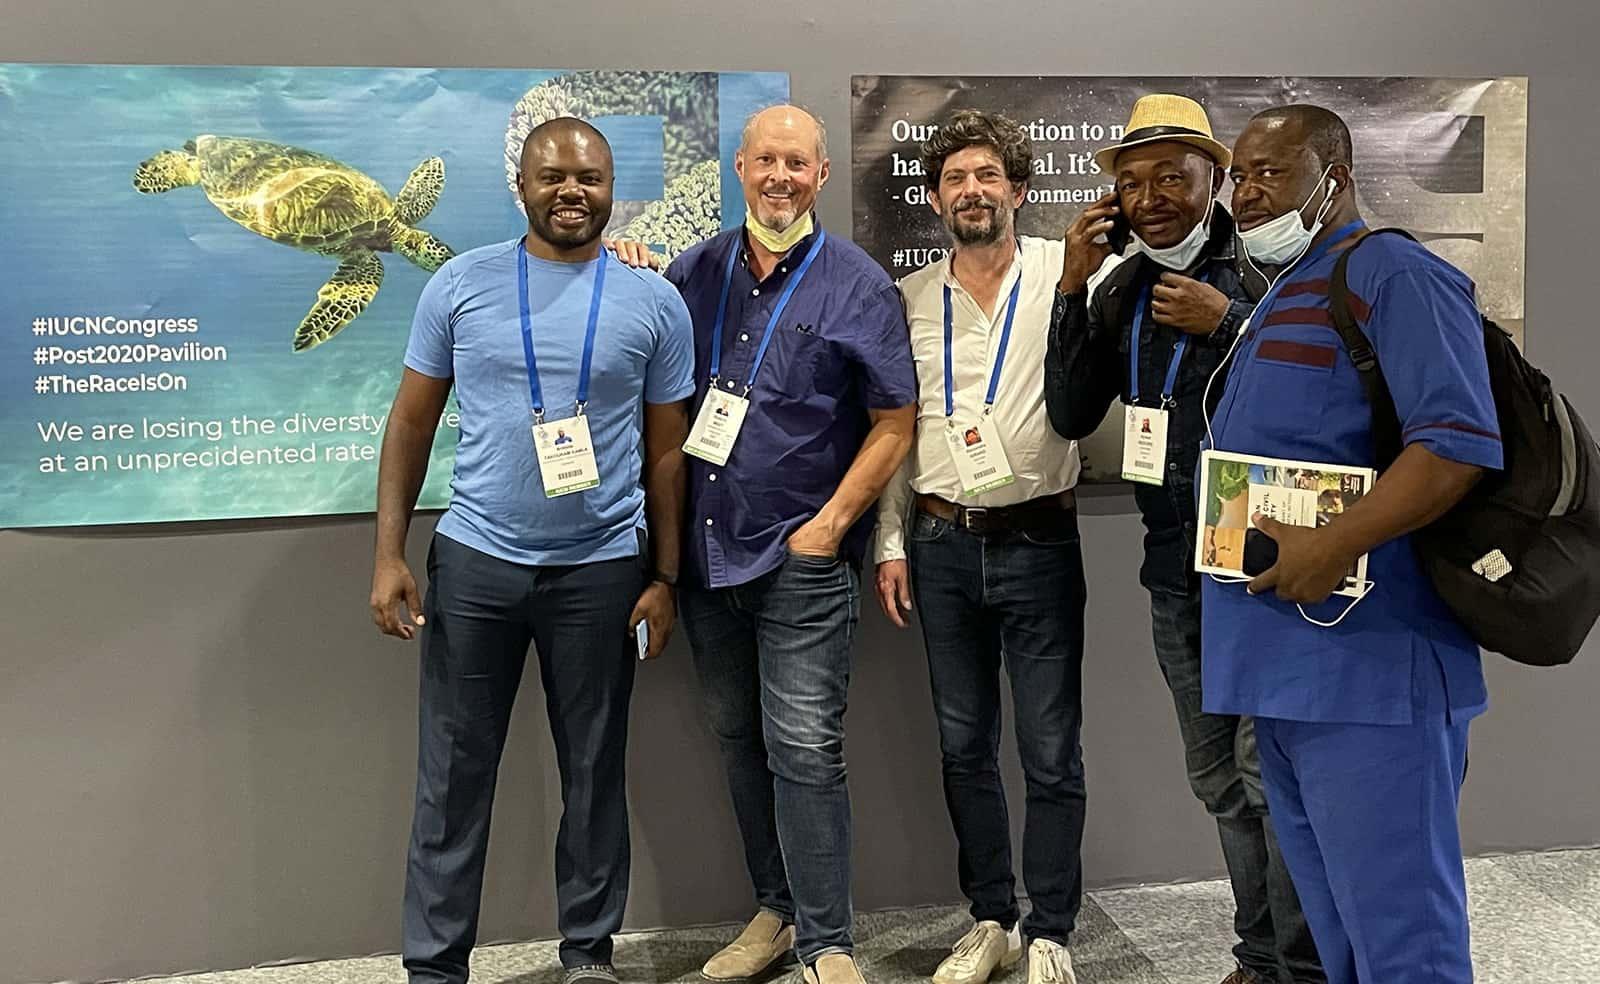 sea turtle specialists at IUCN Congress